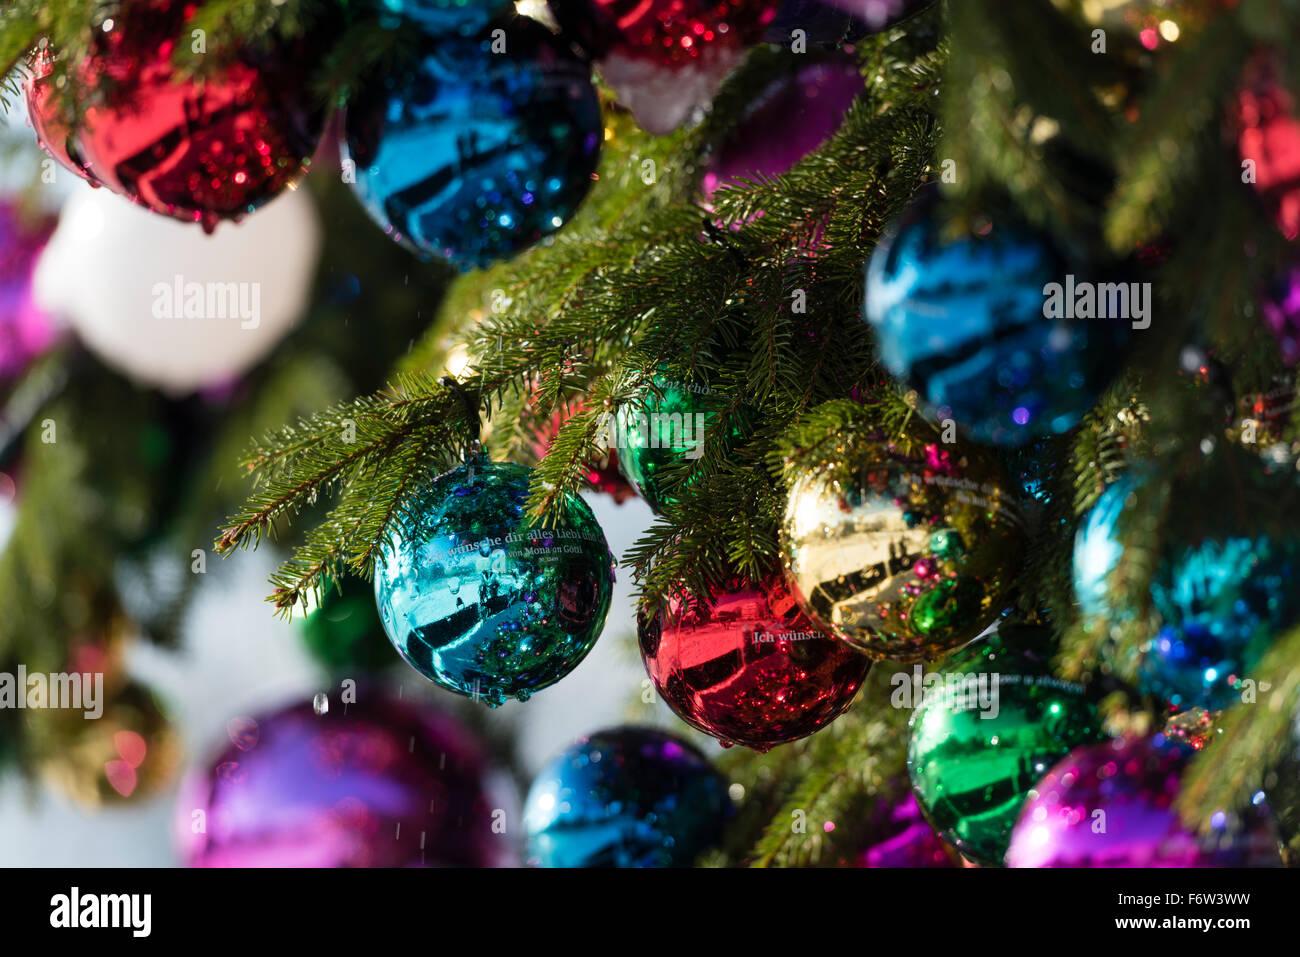 Colourful Christmas ball ornaments on a giant Christmas tree on Saechselaeutenplatz, outside Zurich Opera house, - Stock Image